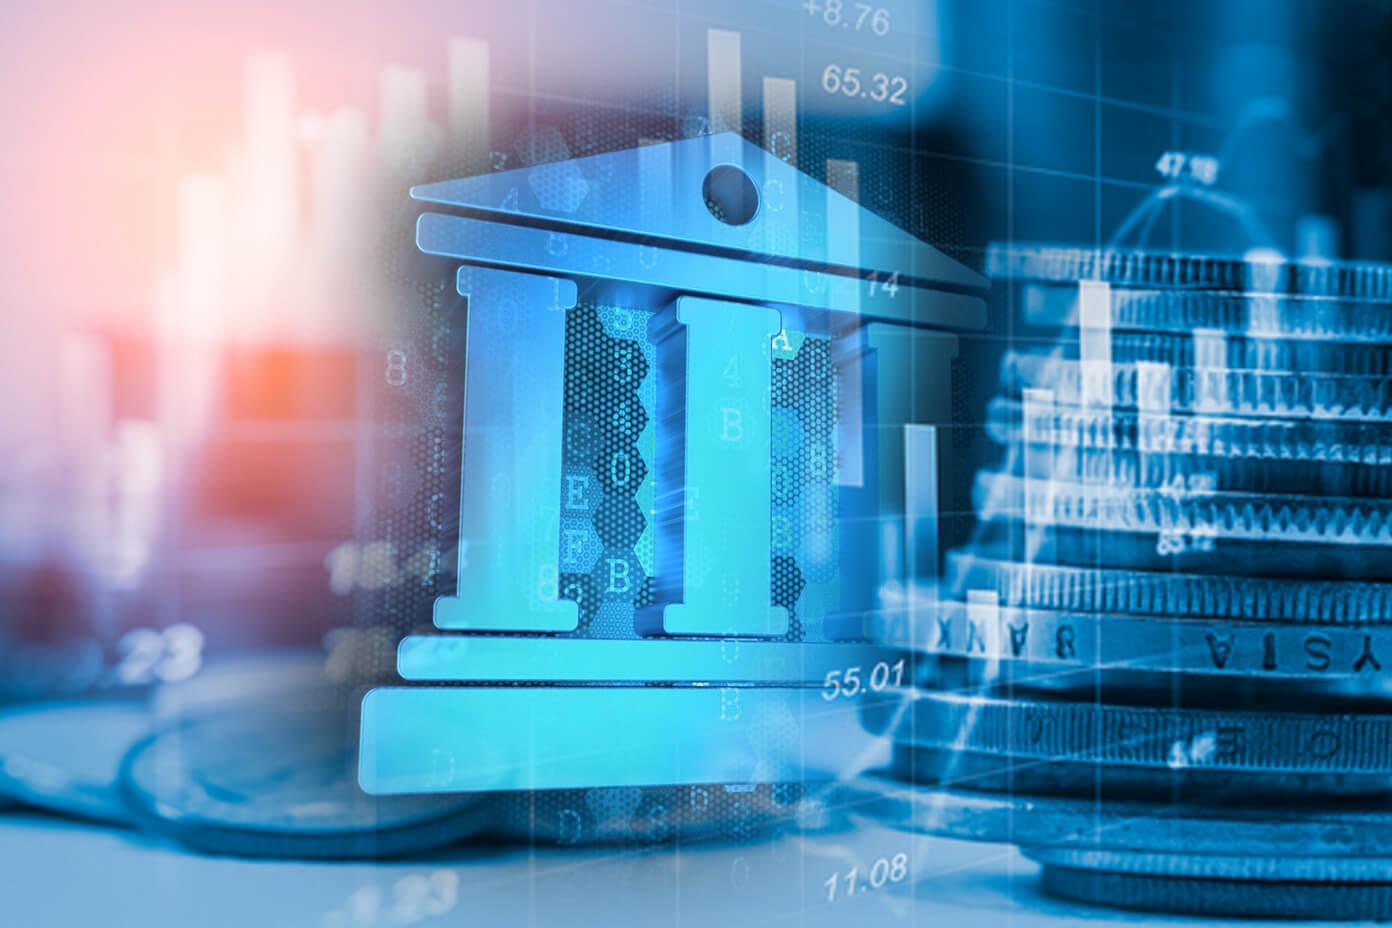 Mengenal Sektor Perbankan dan Jenis-jenisnya Lebih Dalam